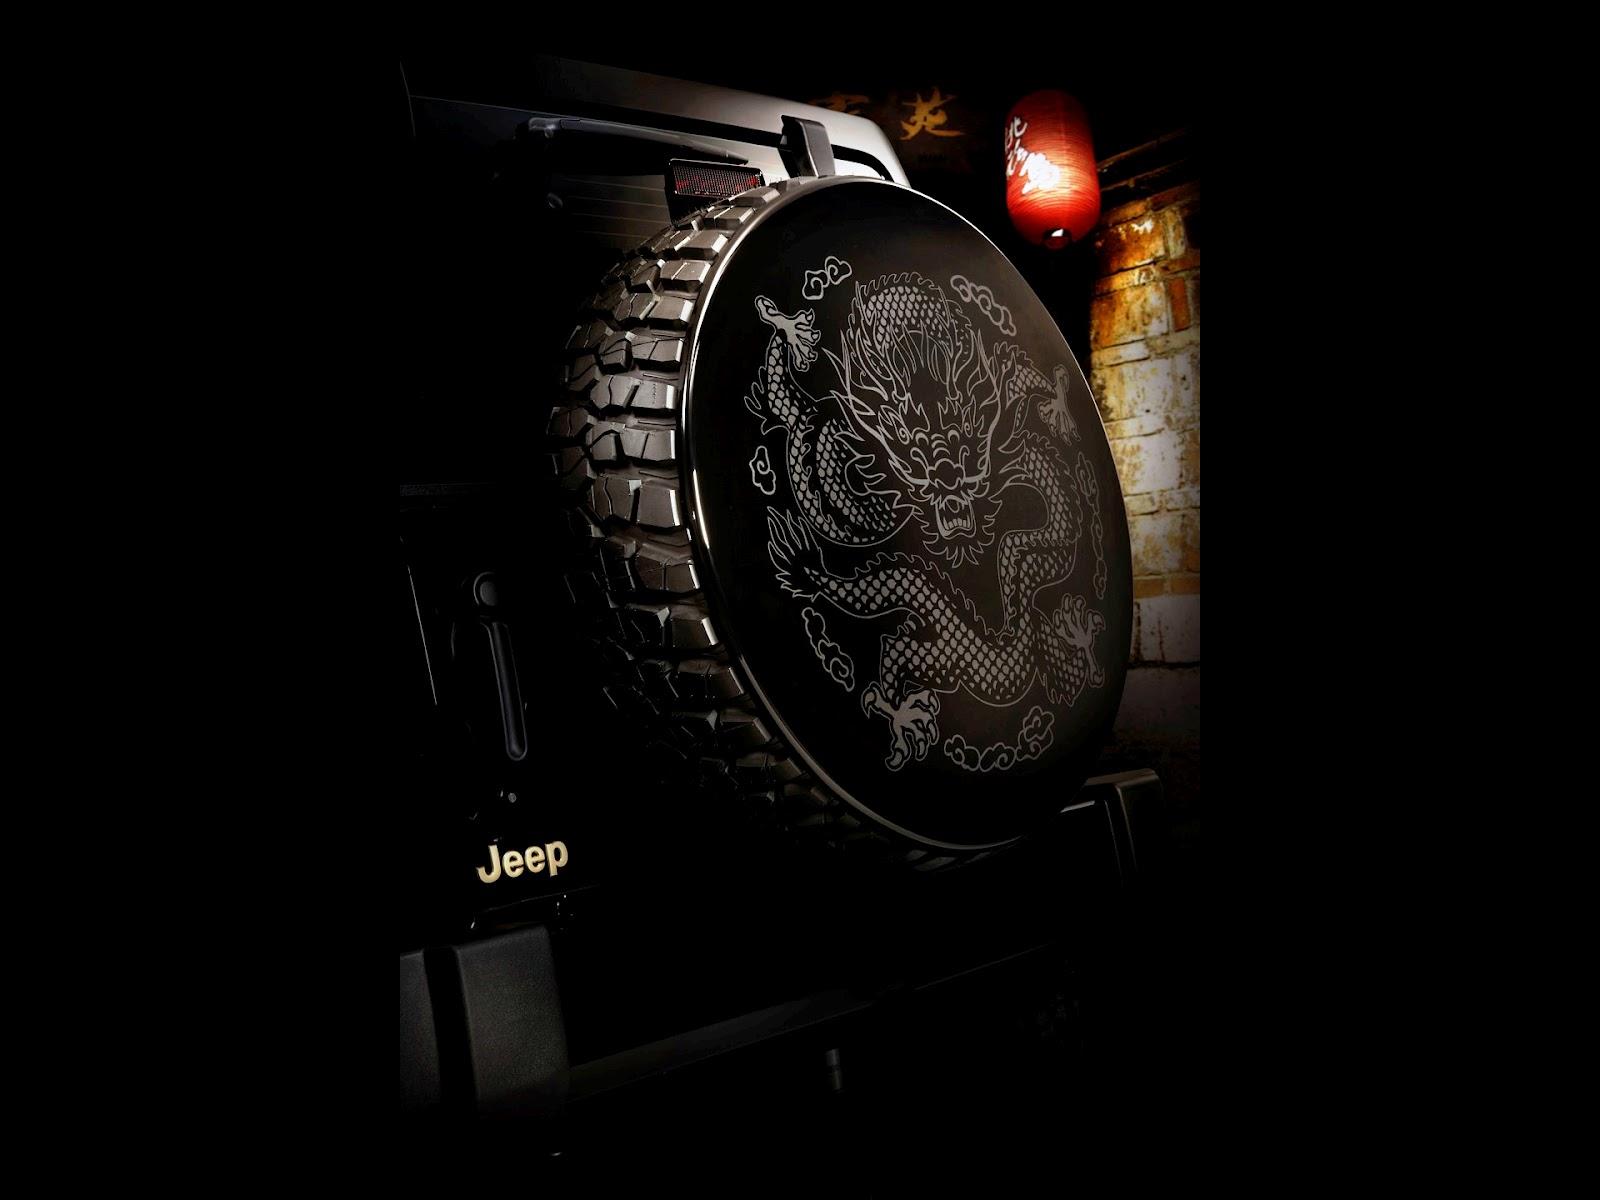 2012 Jeep Dragon Design News Hot Car